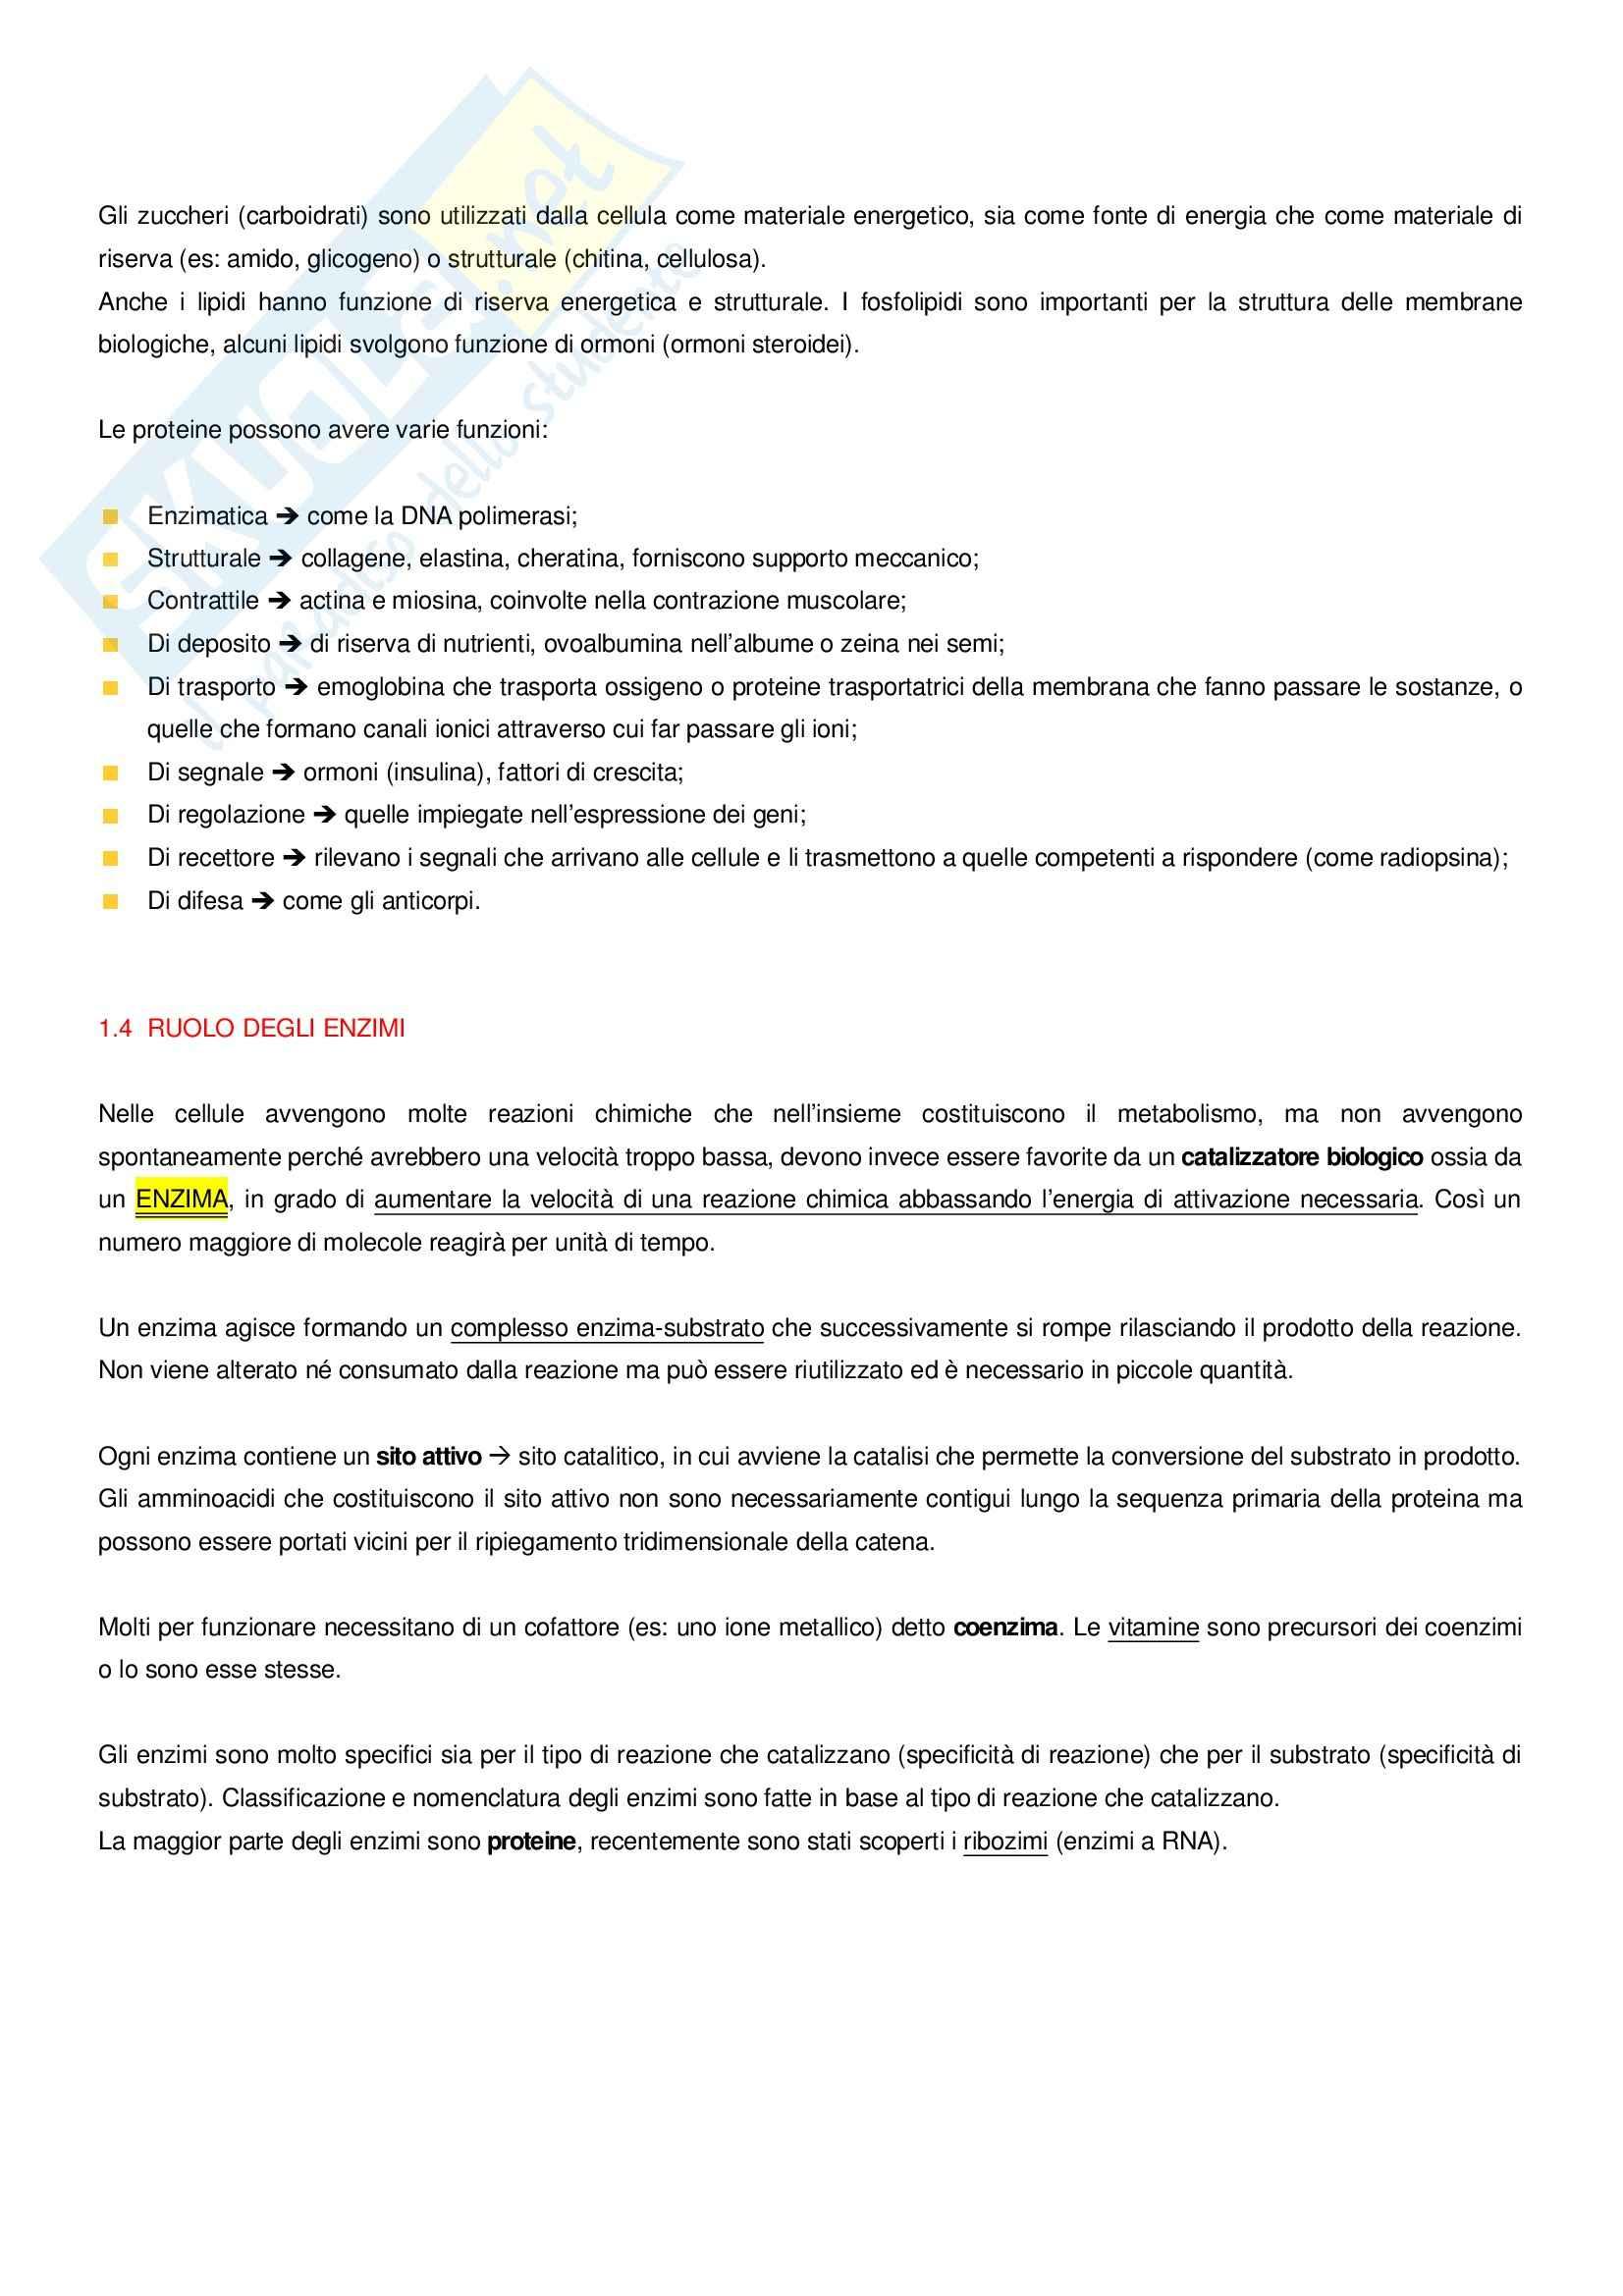 Basi biologiche Pag. 2